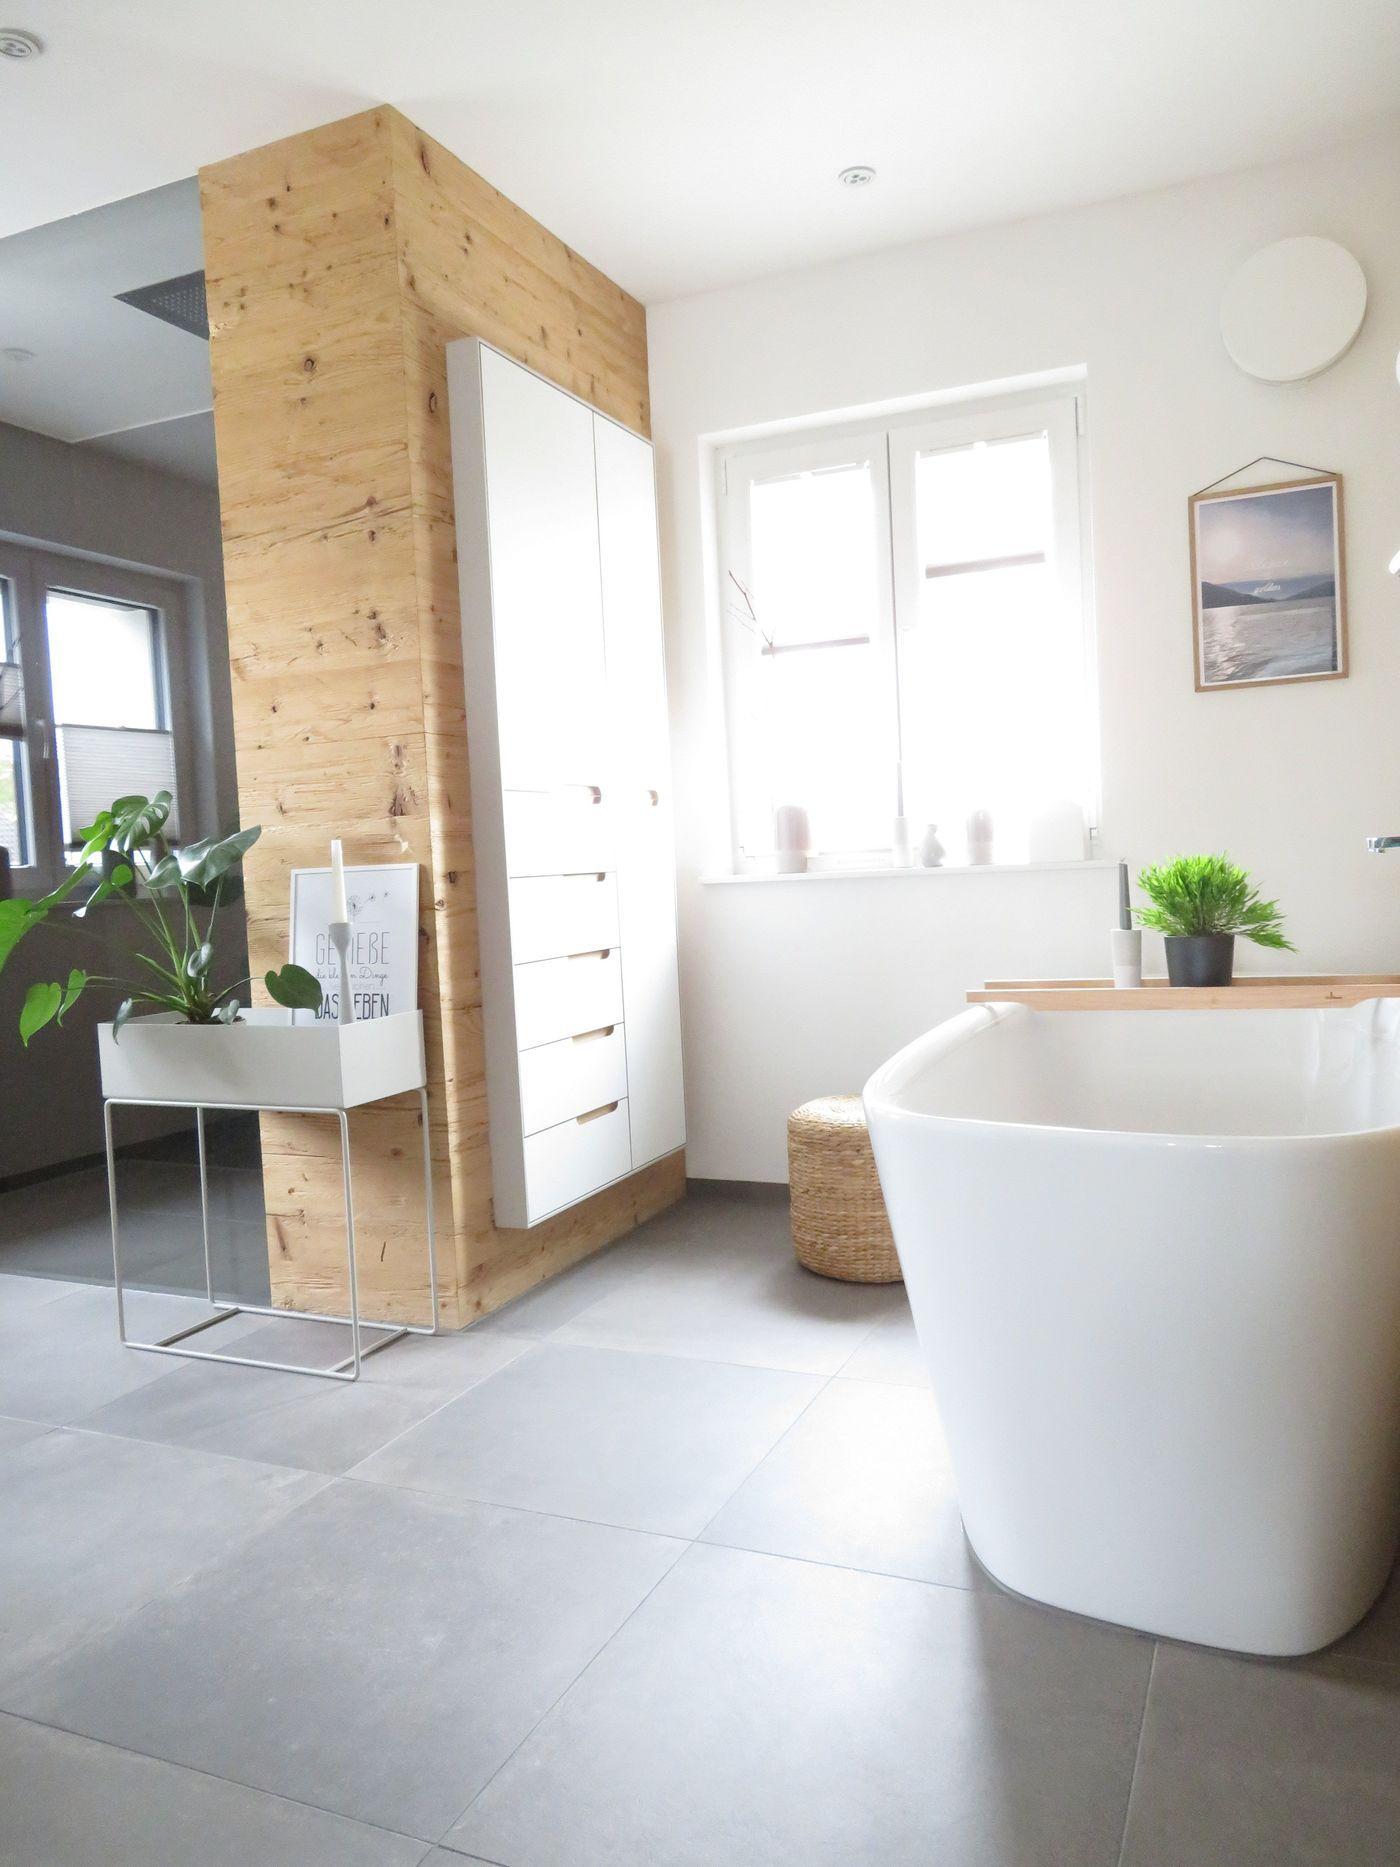 Dekoideen Fürs Bad | Bad Selbst Gestalten Luxus 977 Besten Dekoideen ...